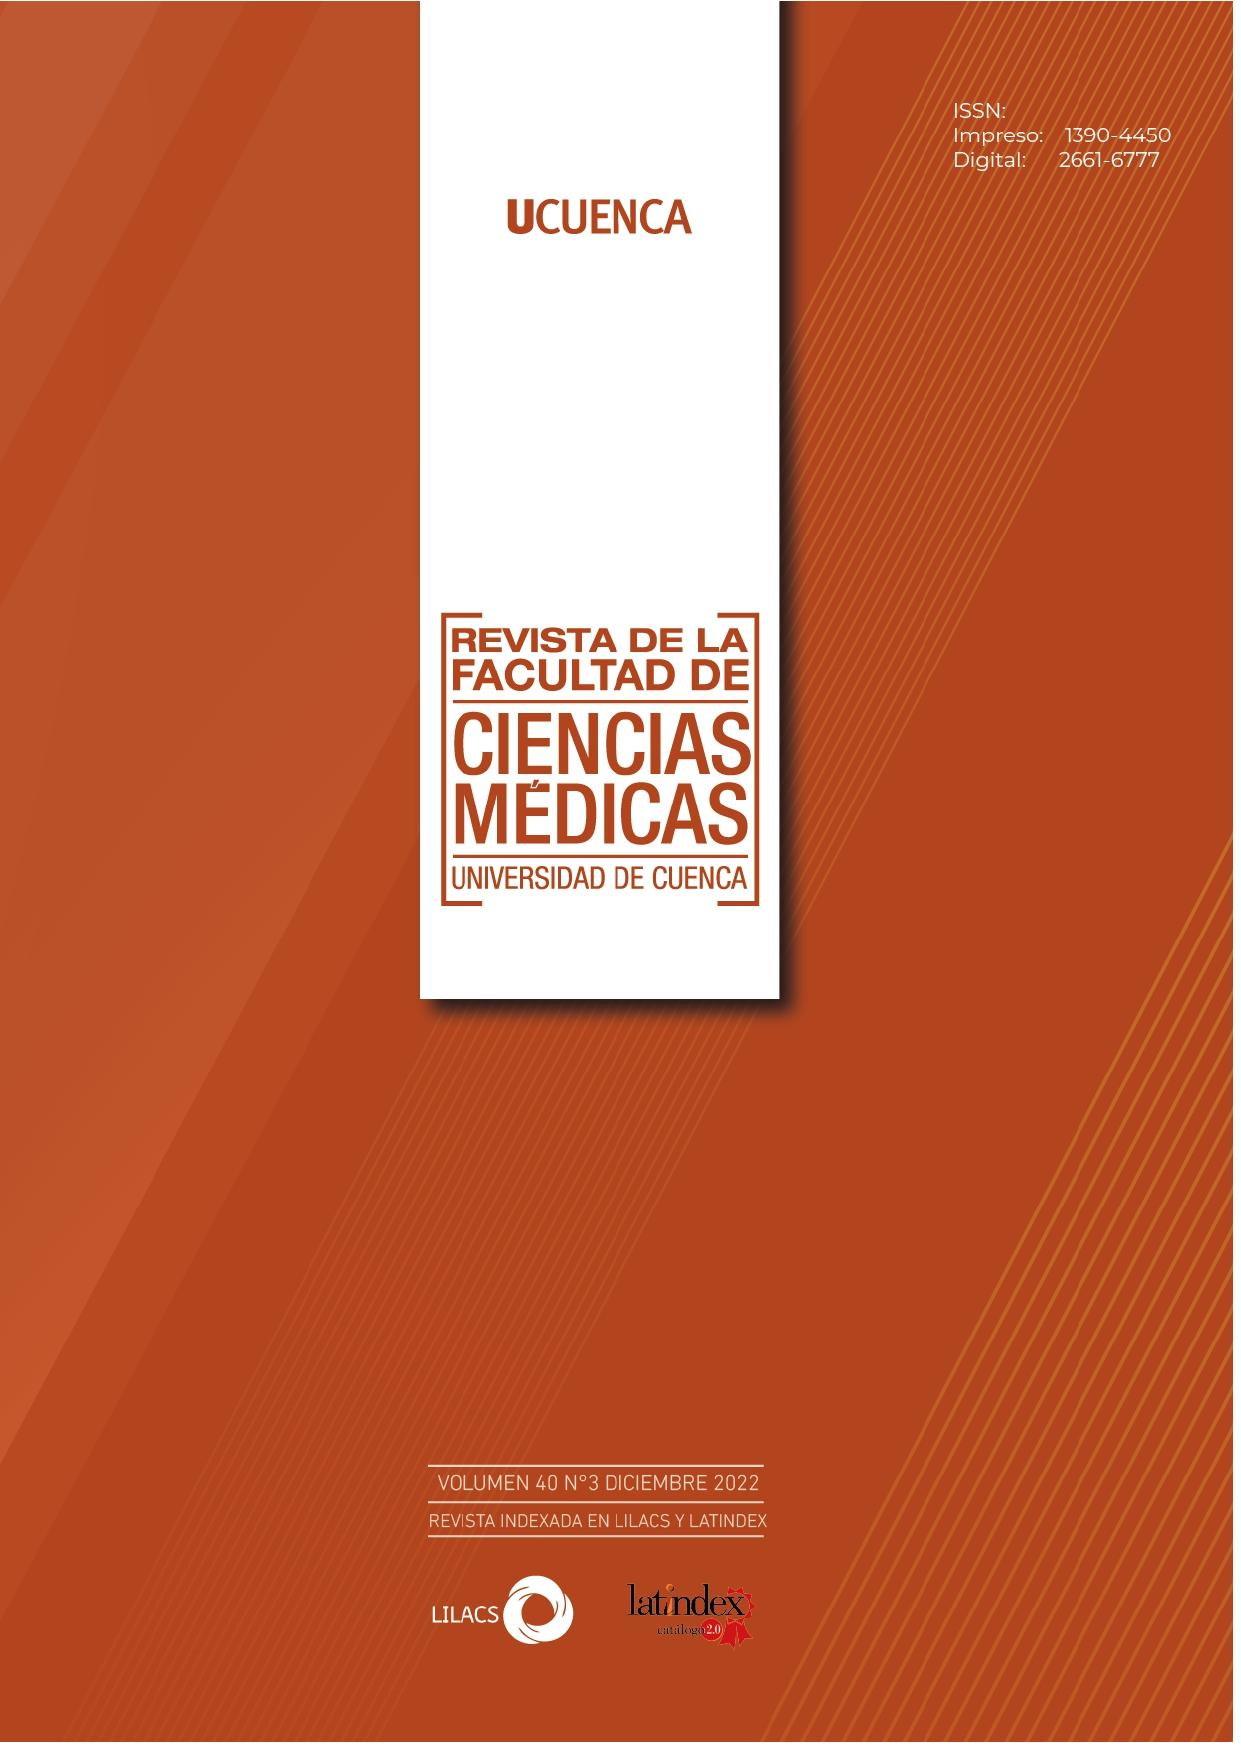 Rev. Fac. Cienc. Méd. Univ. Cuenca. 2017